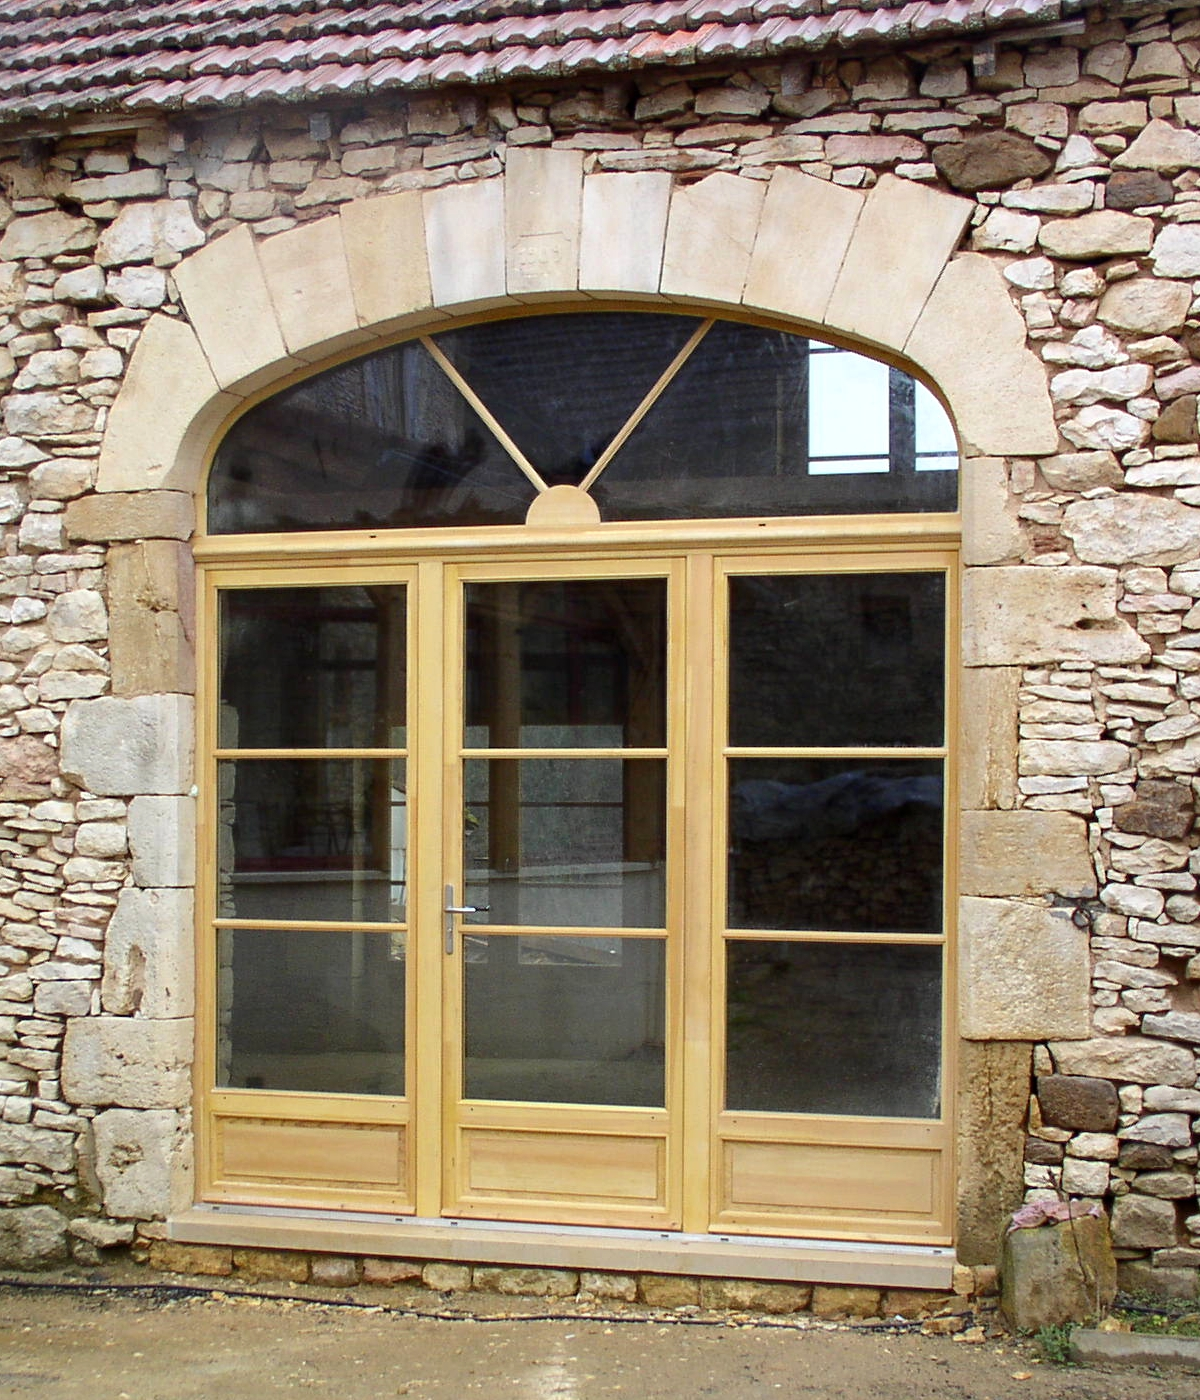 Porte-fenêtre en pin sylvestre avec imposte en anse de panier